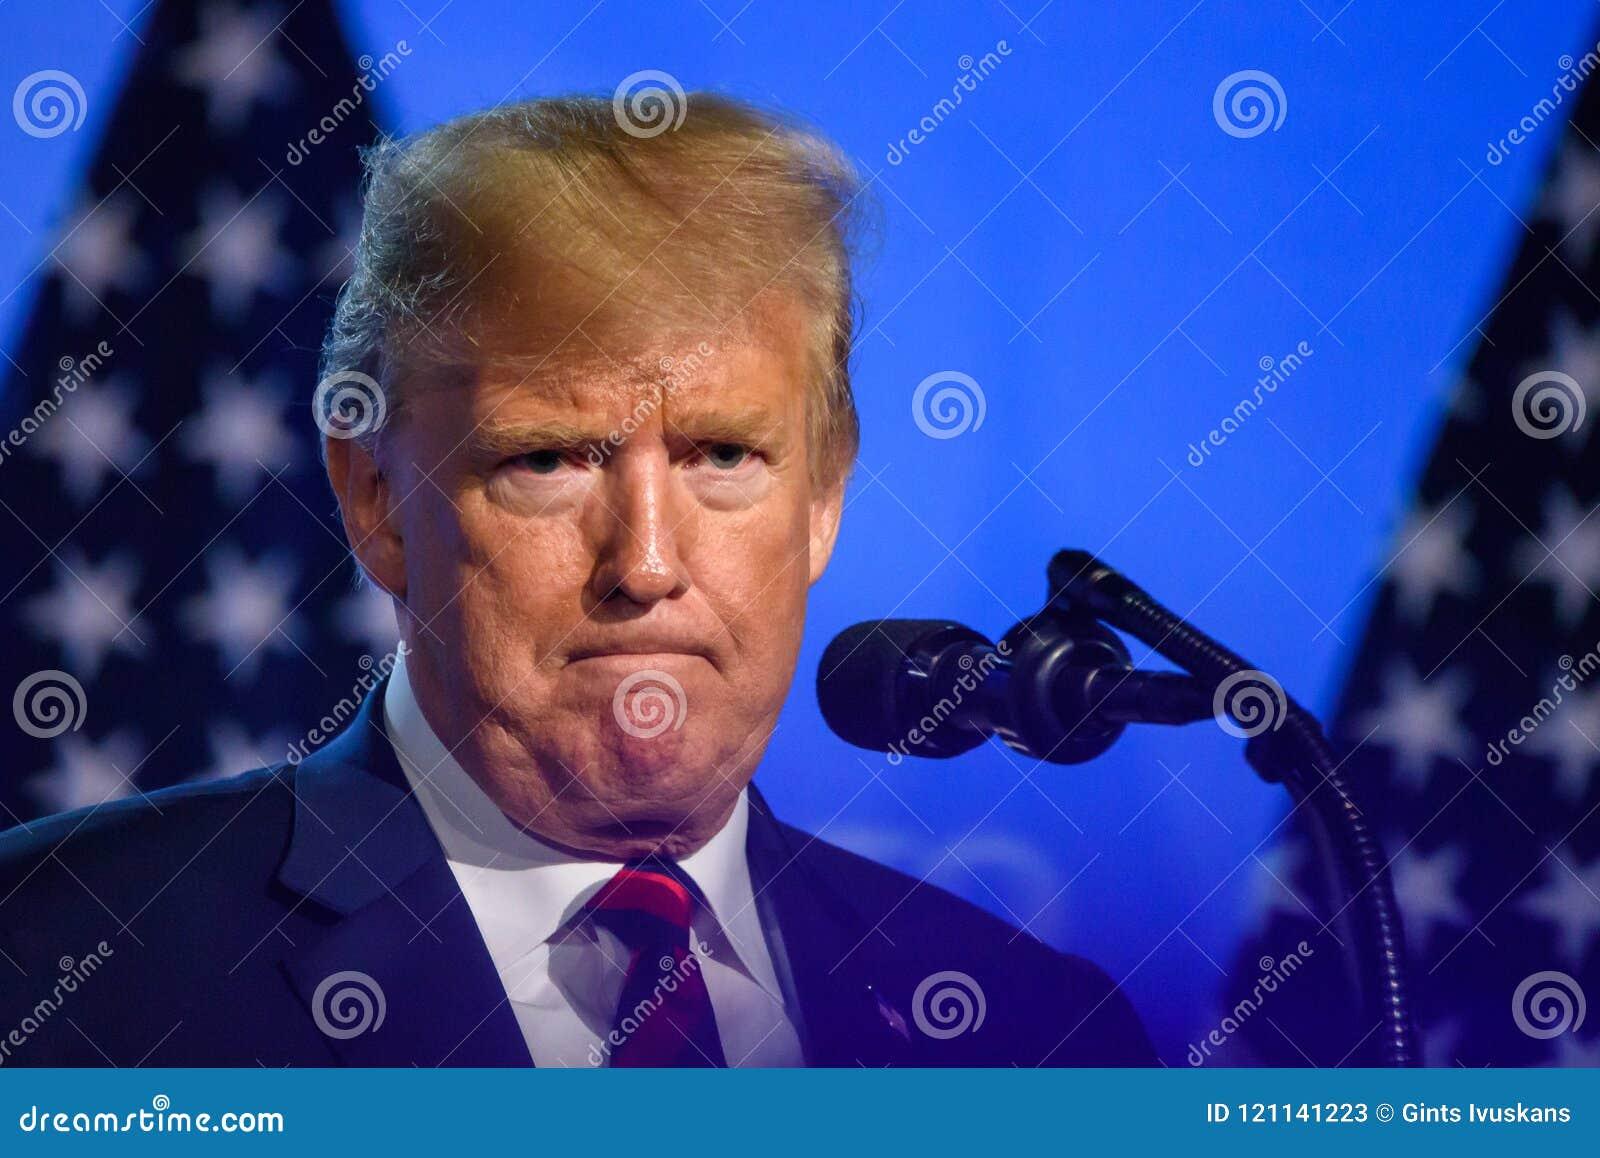 Donald Trump, presidente do Estados Unidos da América, durante a conferência de imprensa na CIMEIRA de OTAN 2018